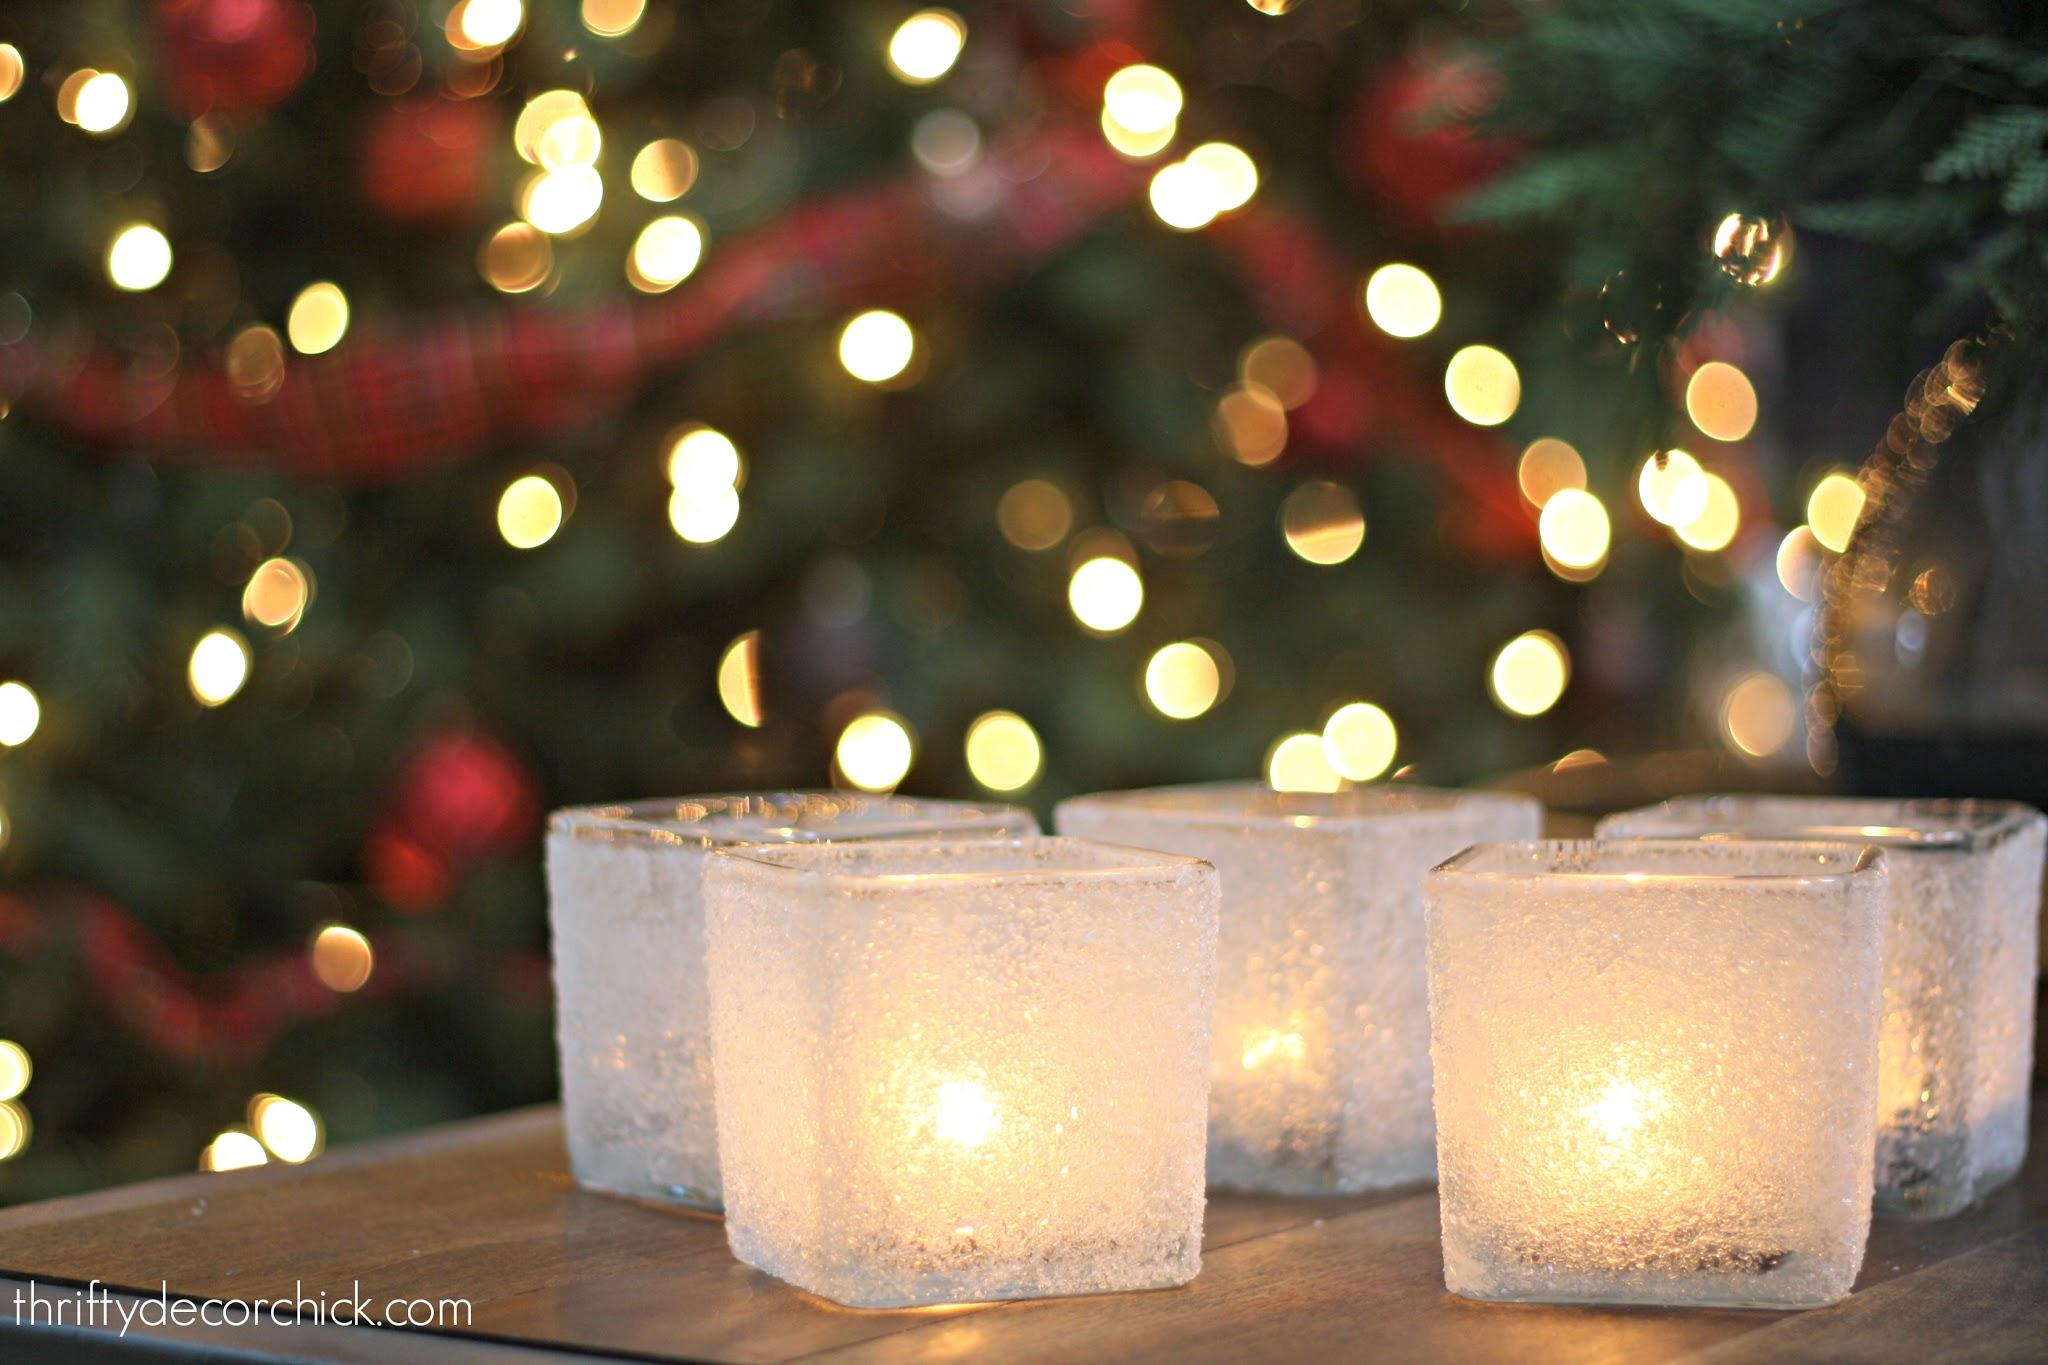 DIY snowy Christmas candle craft